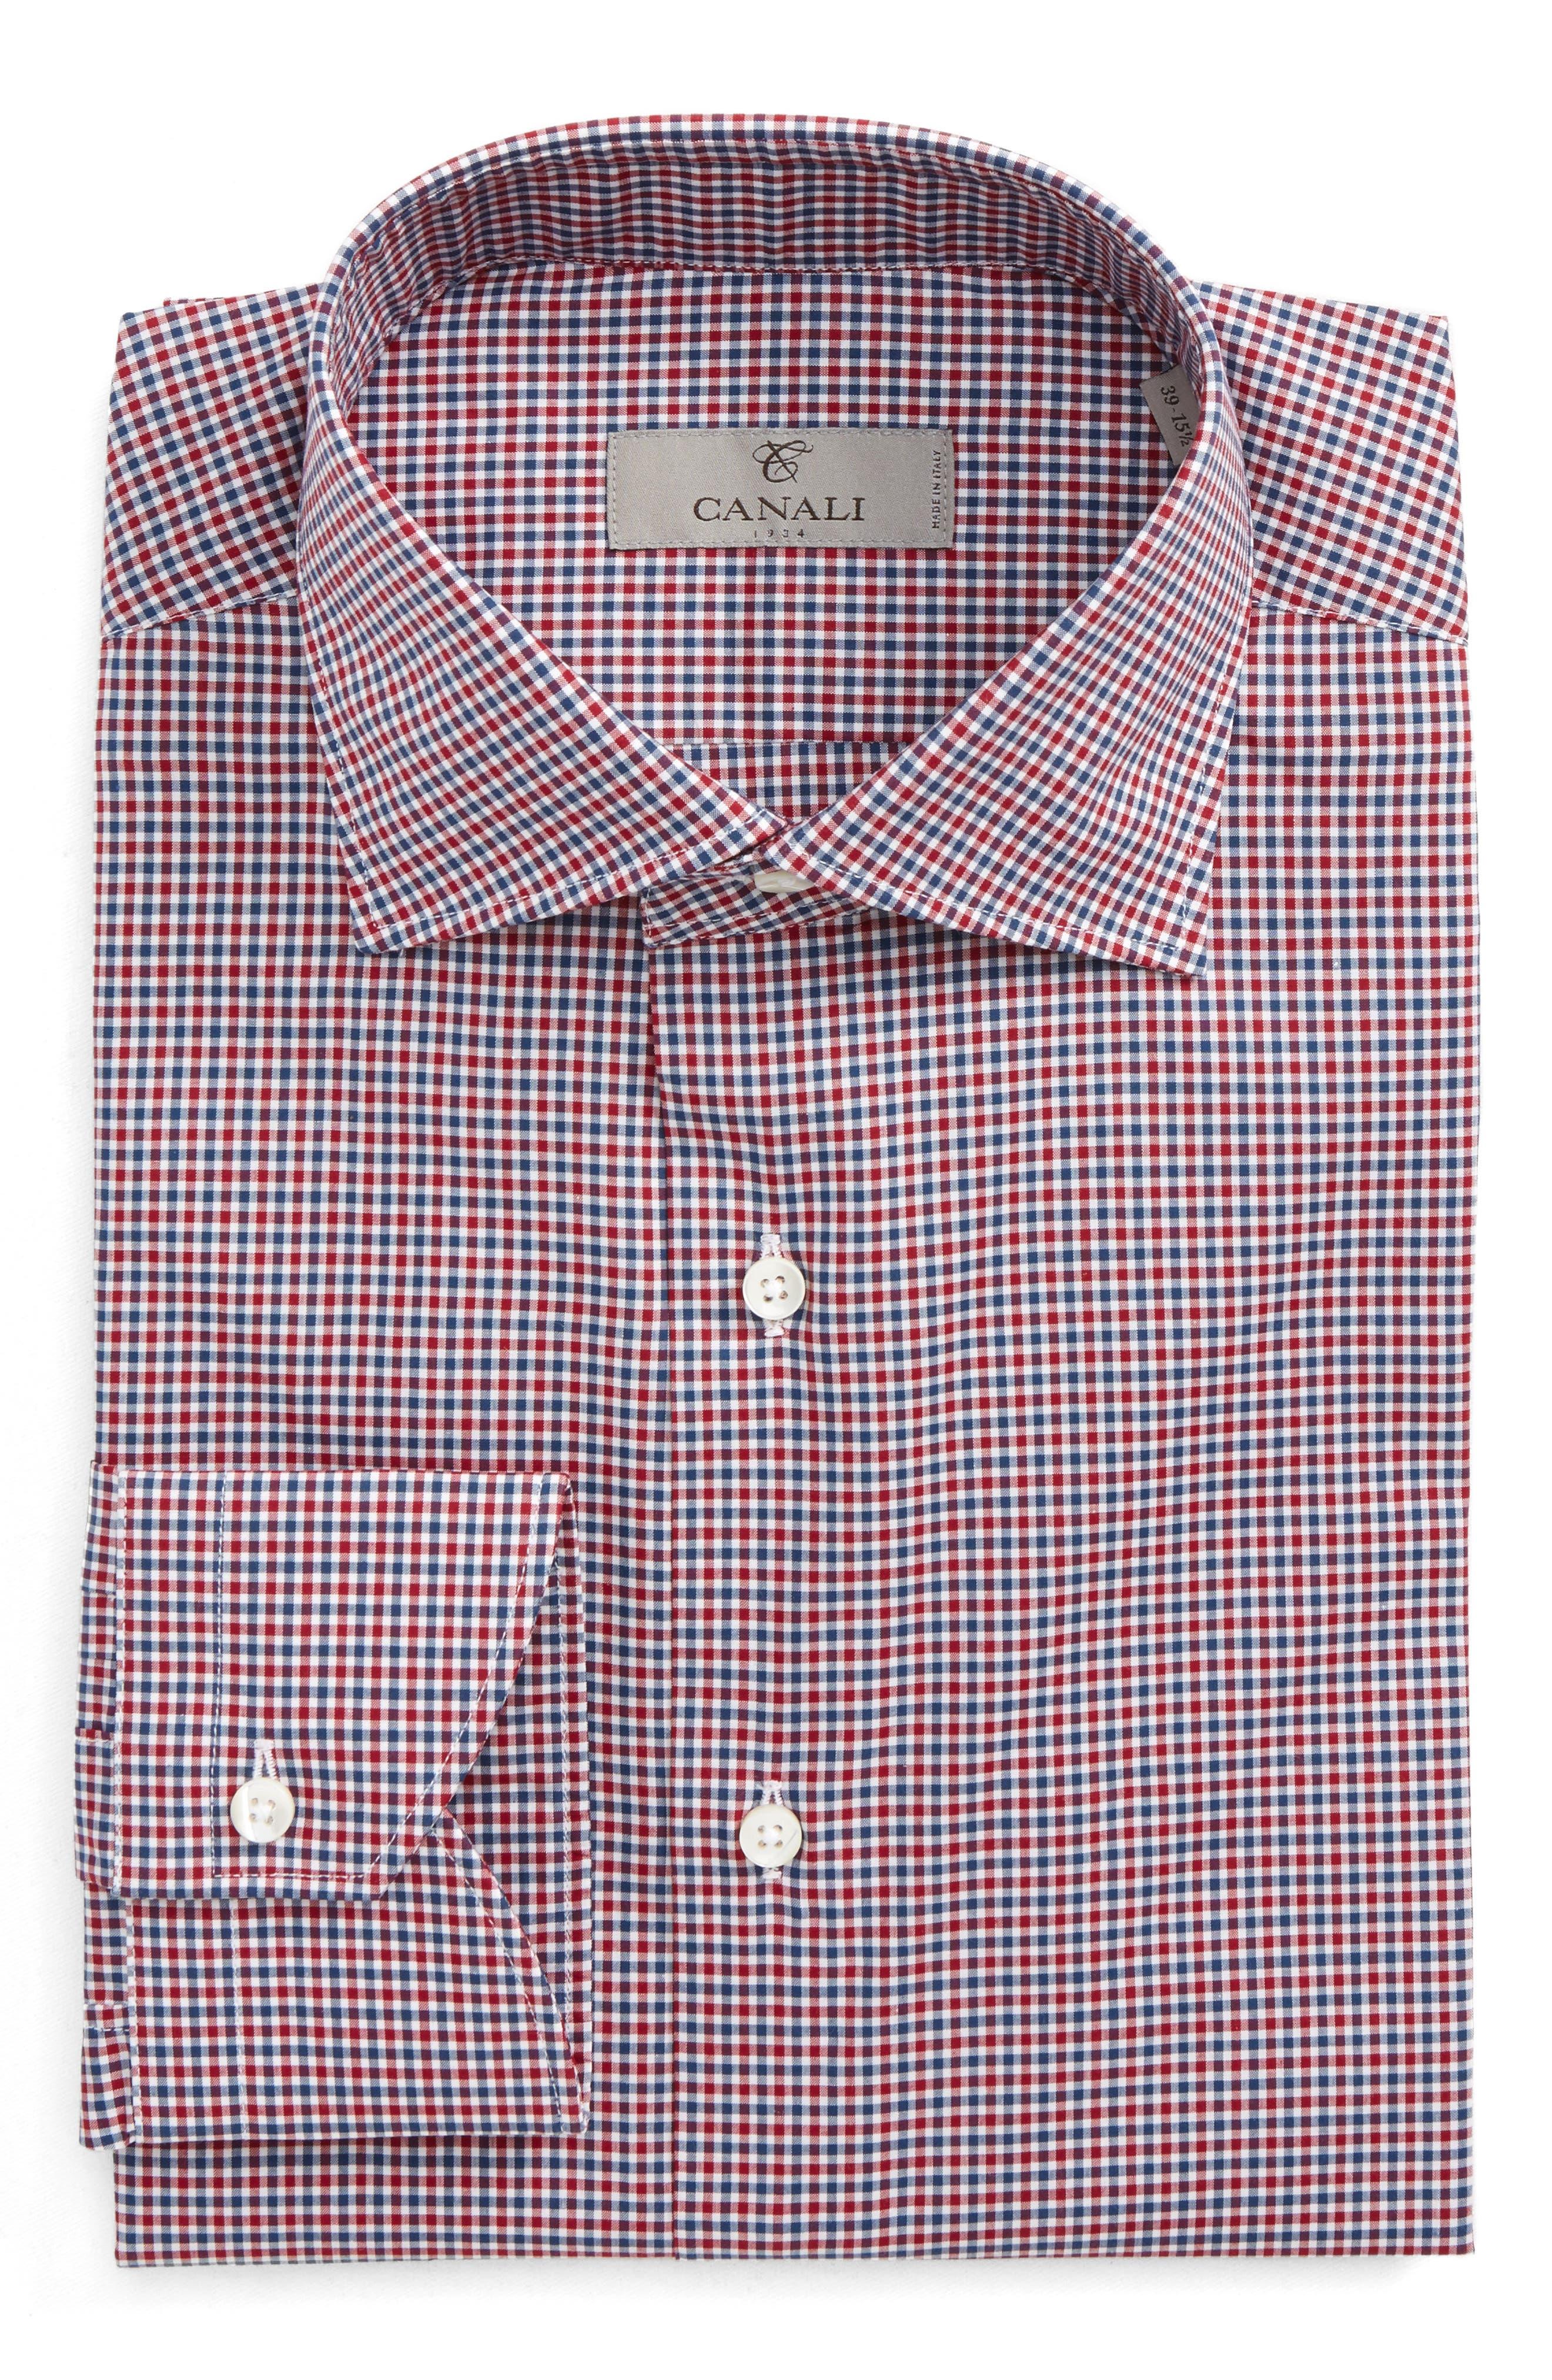 Regular Fit Dress Shirt,                             Main thumbnail 1, color,                             620